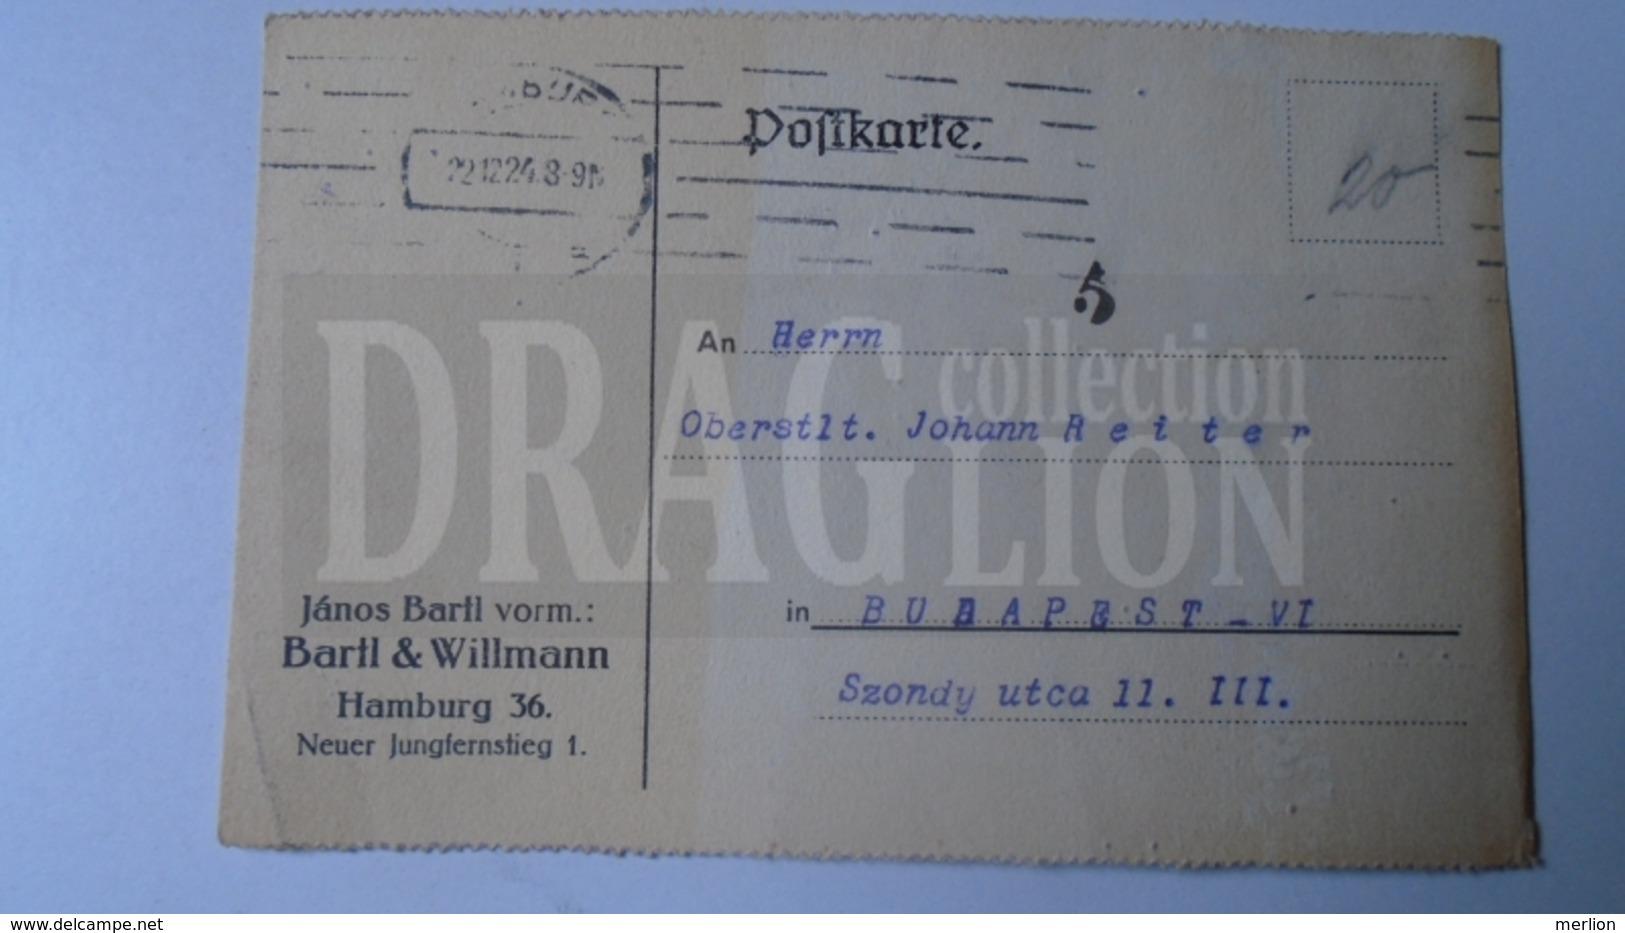 D159891  Commercial Postcard - Bartl & Willmann - HAMBURG  - Sent To    1924 Oberst Johann Reiter  Budapest - Italia